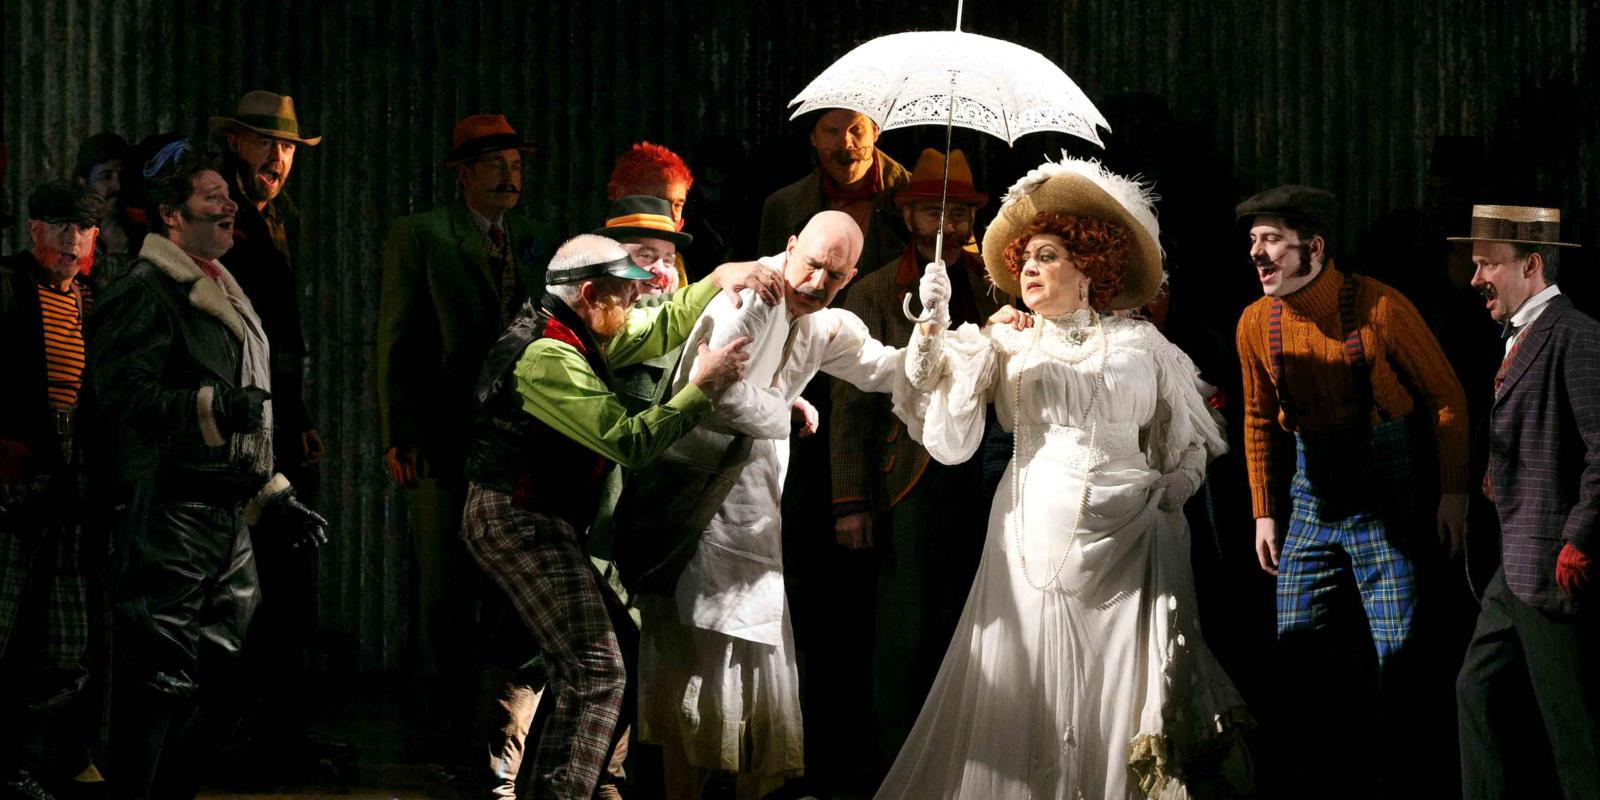 An image of Alan Oke, Sarah Pring and members of the ENO Chorus in Phelim McDermott's 2013 production of Satyagraha